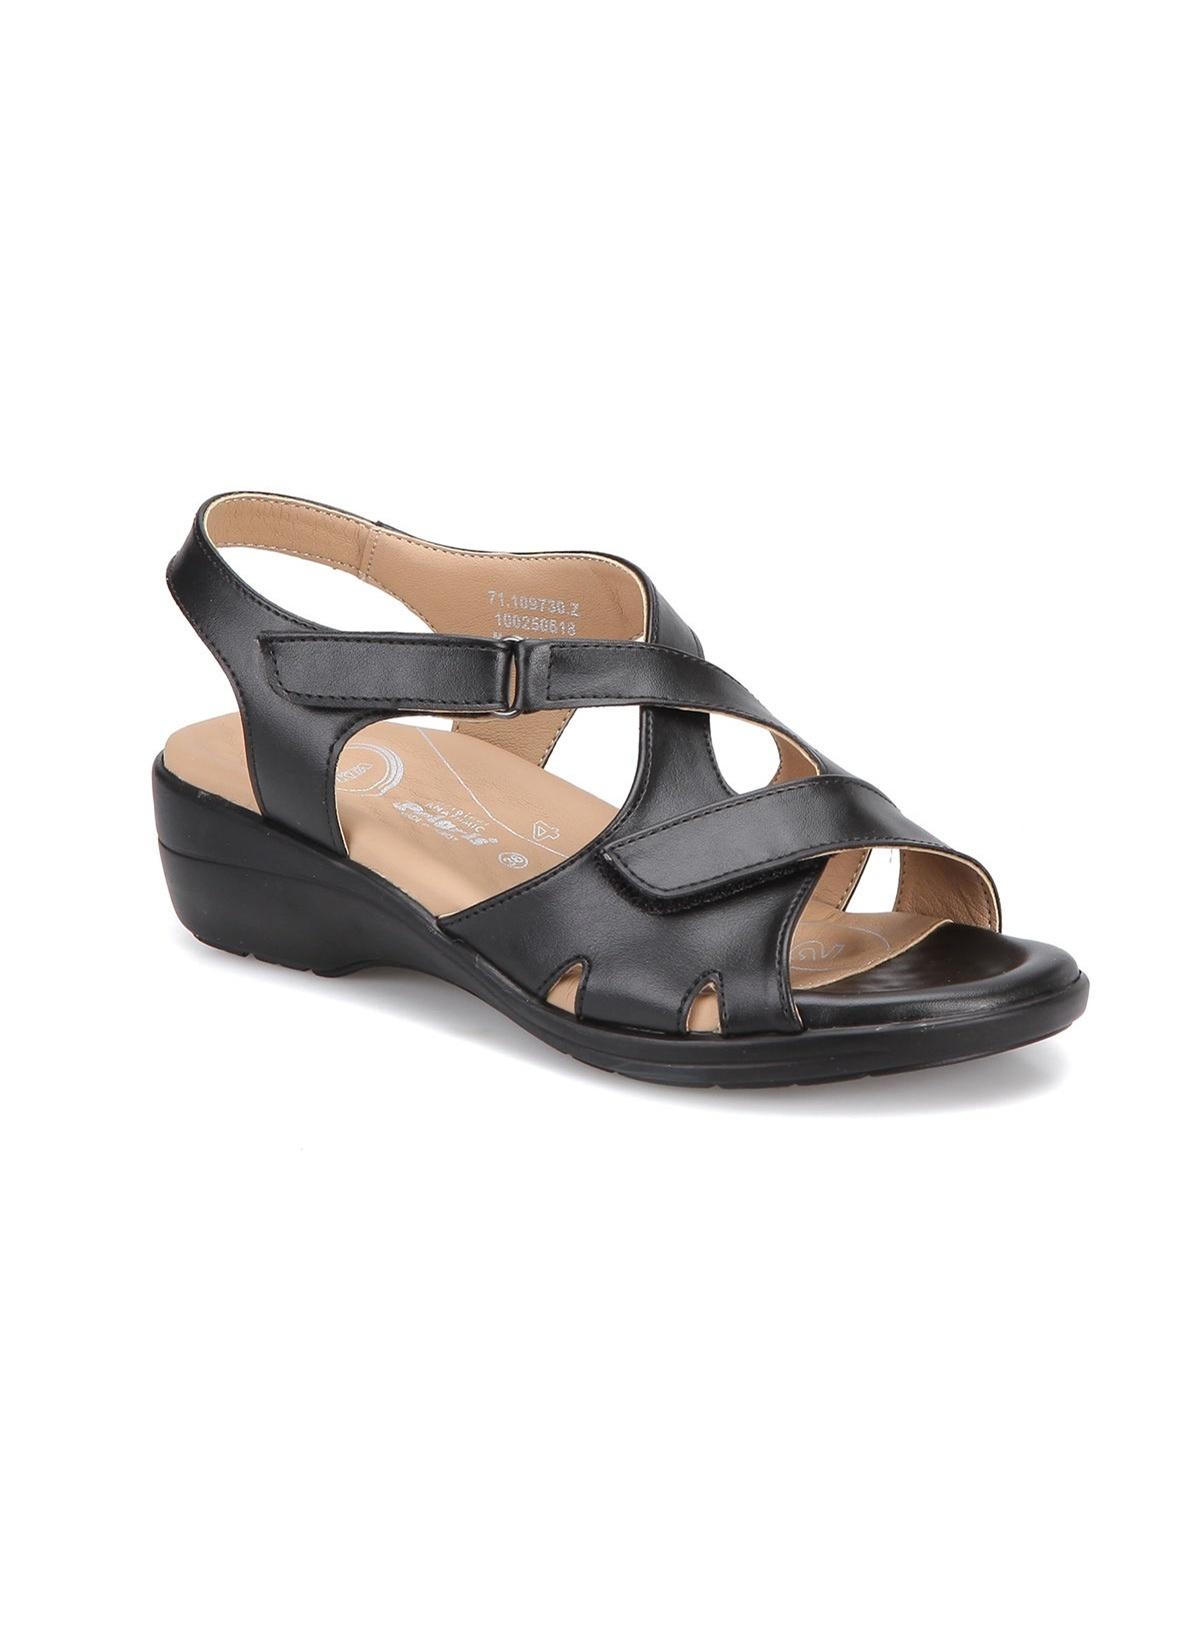 Polaris Sandalet 71.109730.z Basic Comfort – 49.99 TL